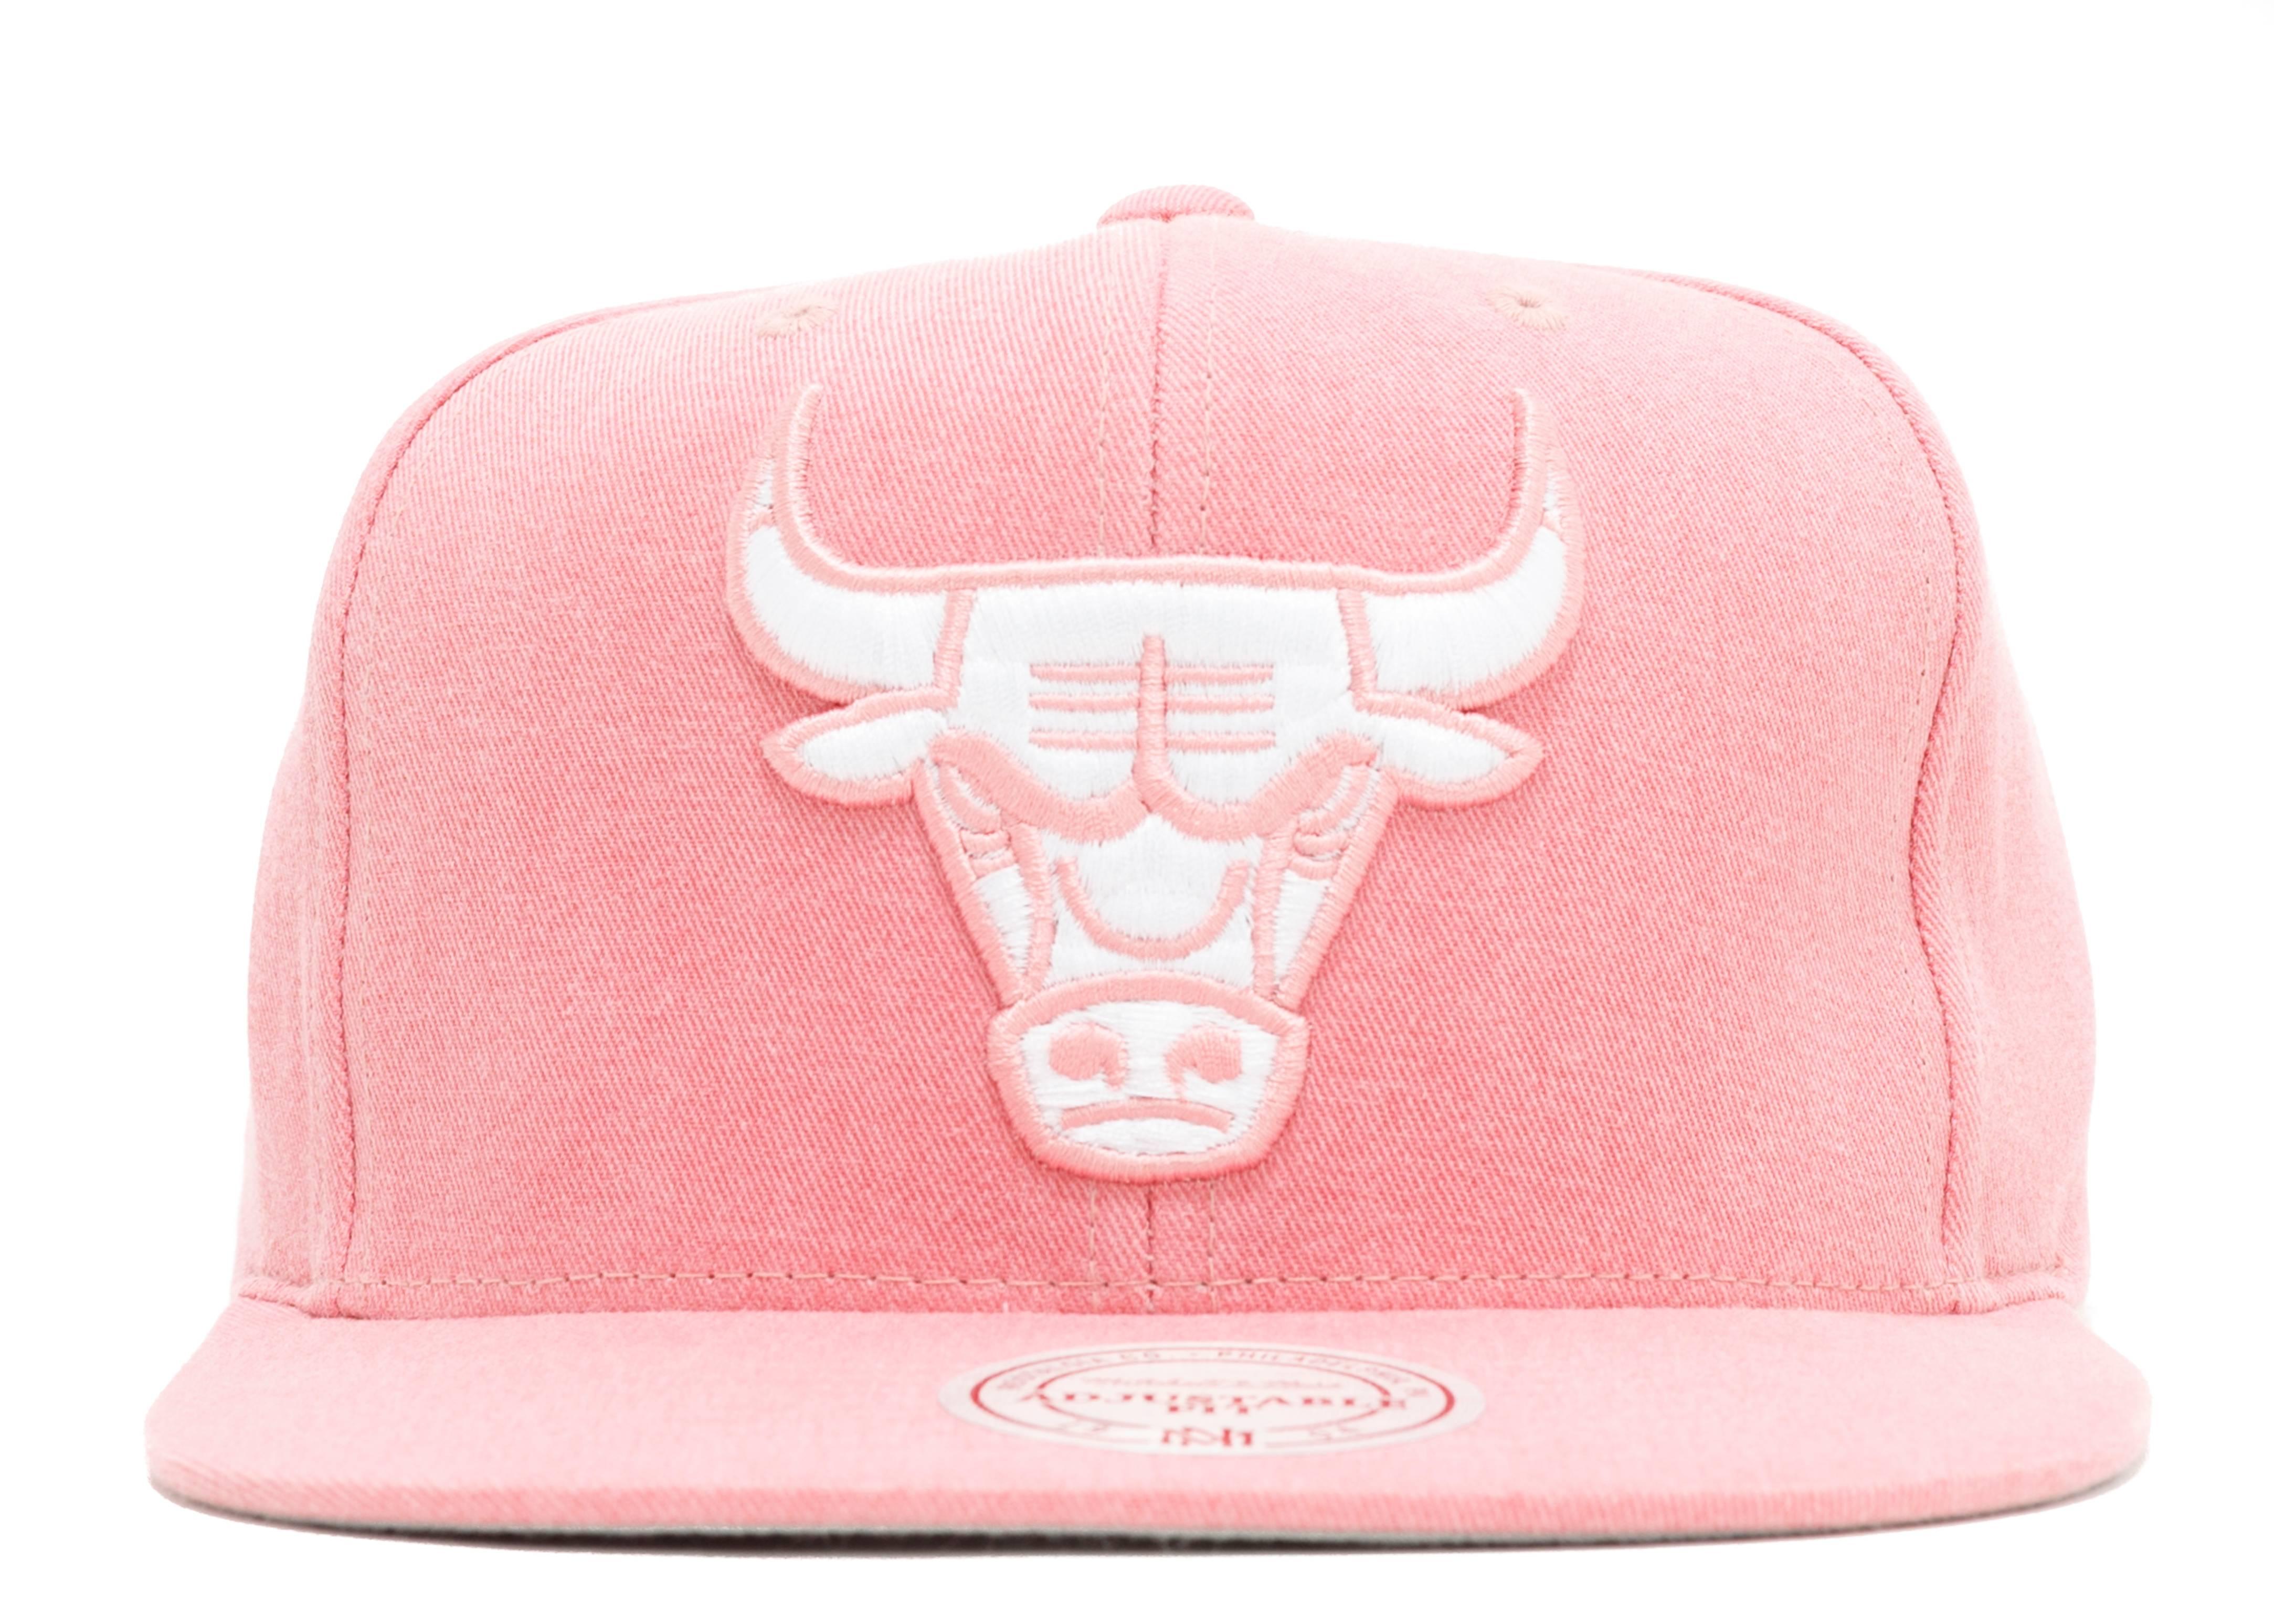 Chicago Bulls Slub Cotton Snap-back - Mitchell   Ness - vr11fas5bulls - pink white   d9d03f274d8